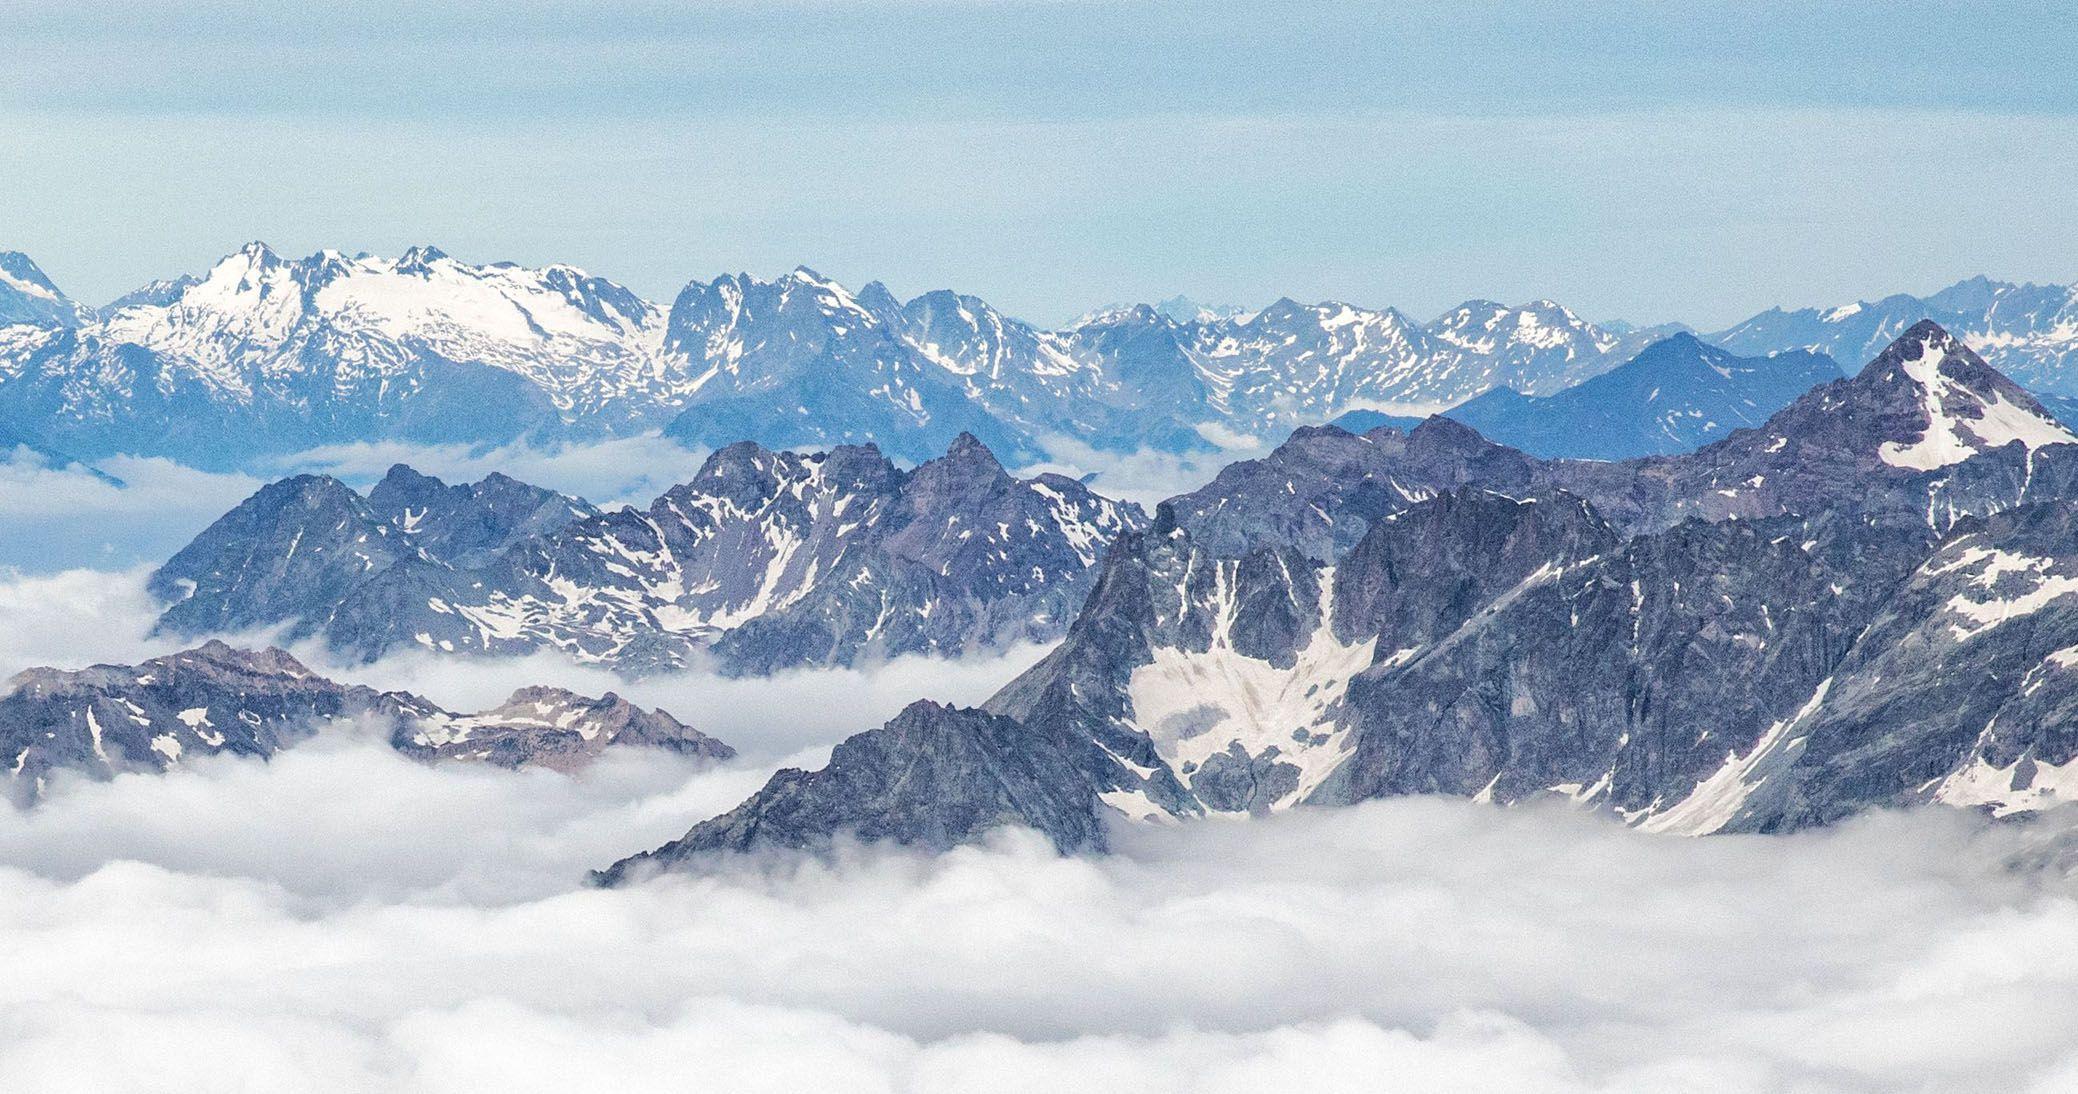 Matterhorn Glacier Paradise View